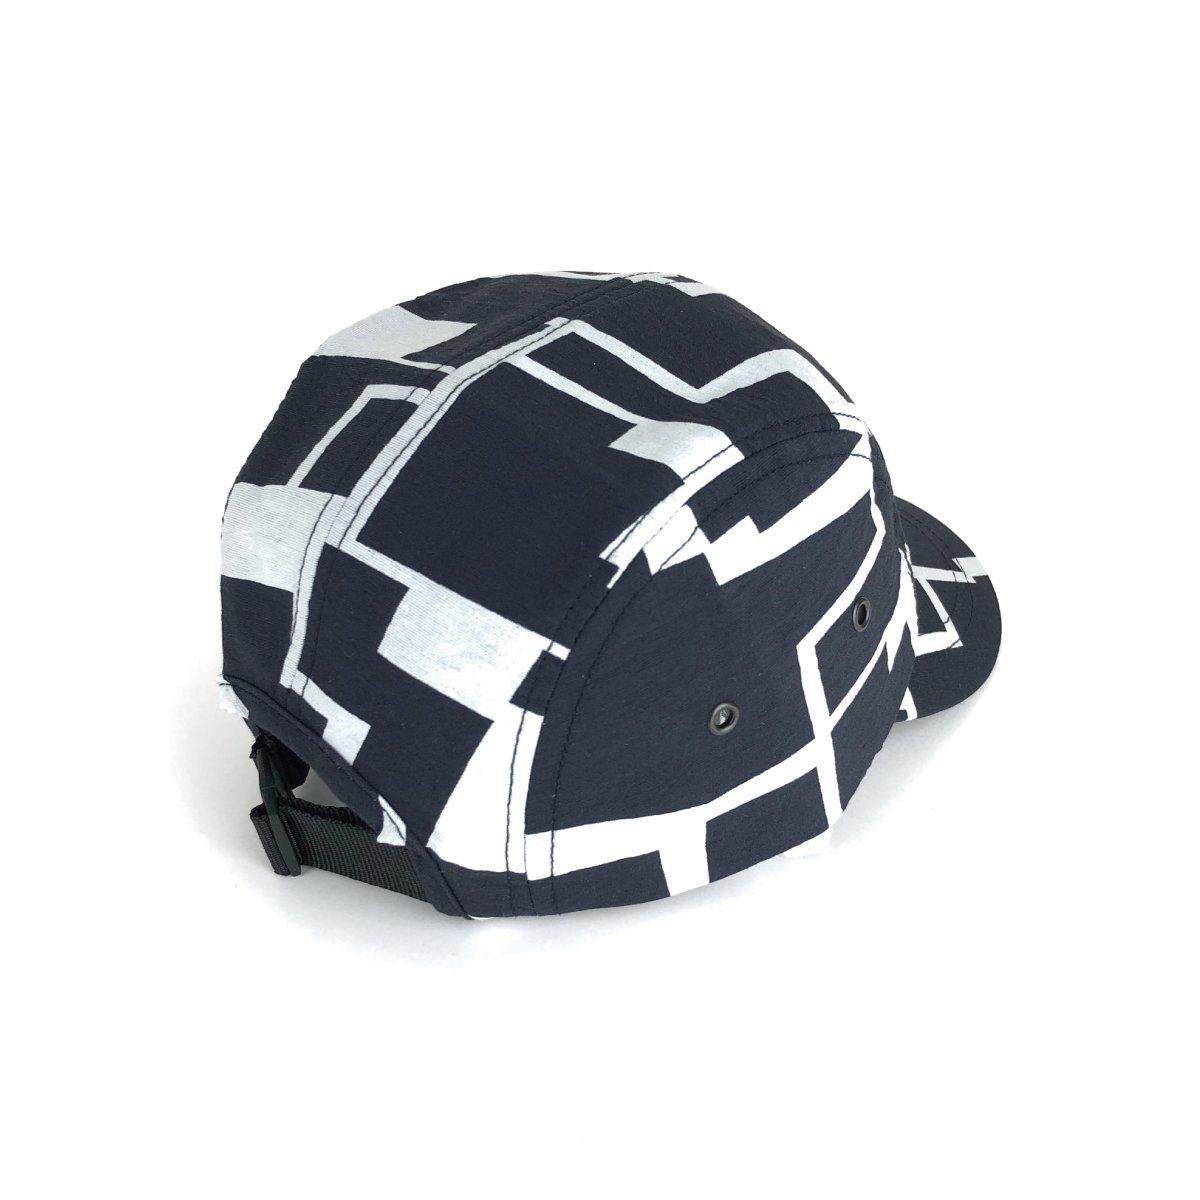 【KIDS】Monotone Jet Cap 詳細画像8